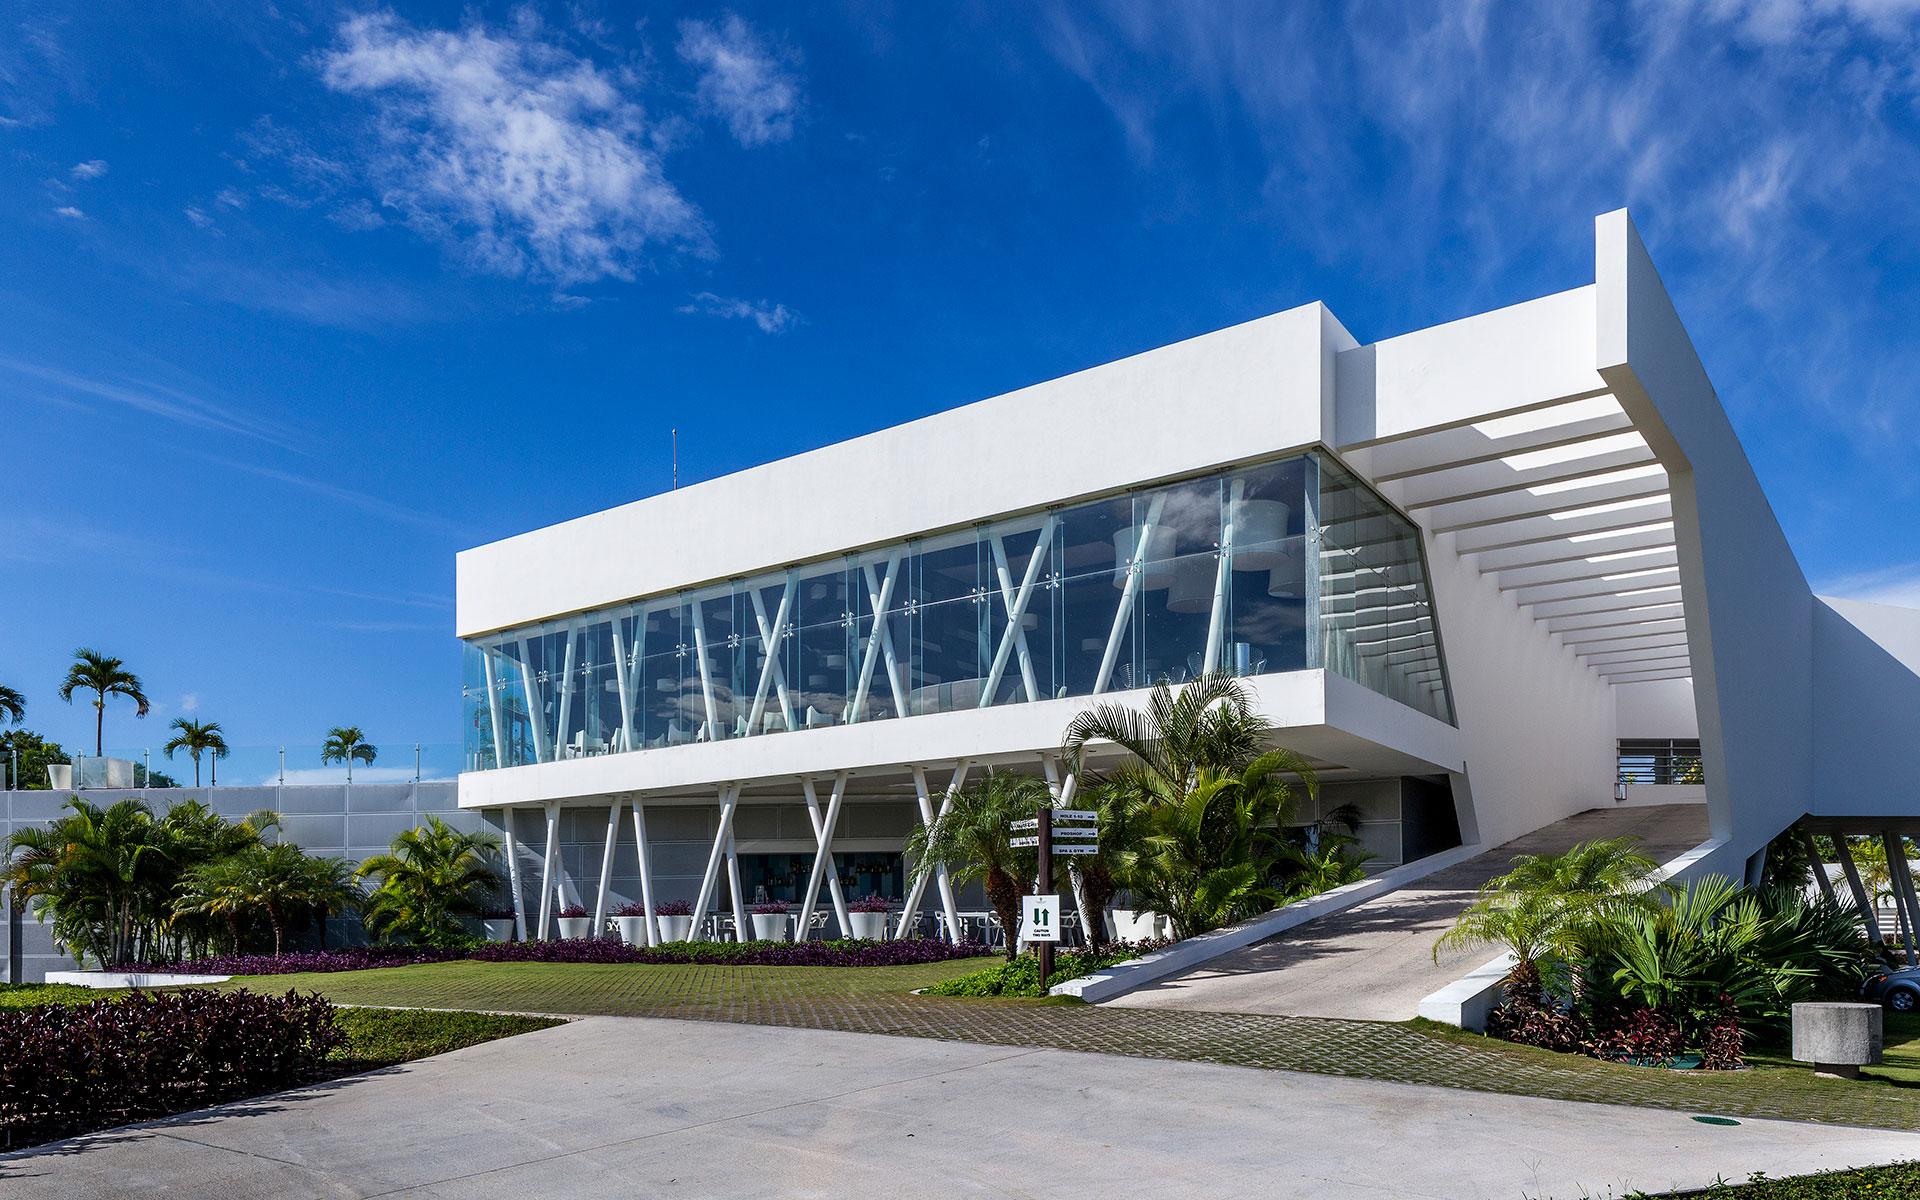 Servicio de arquitectura y diseno daniel cota